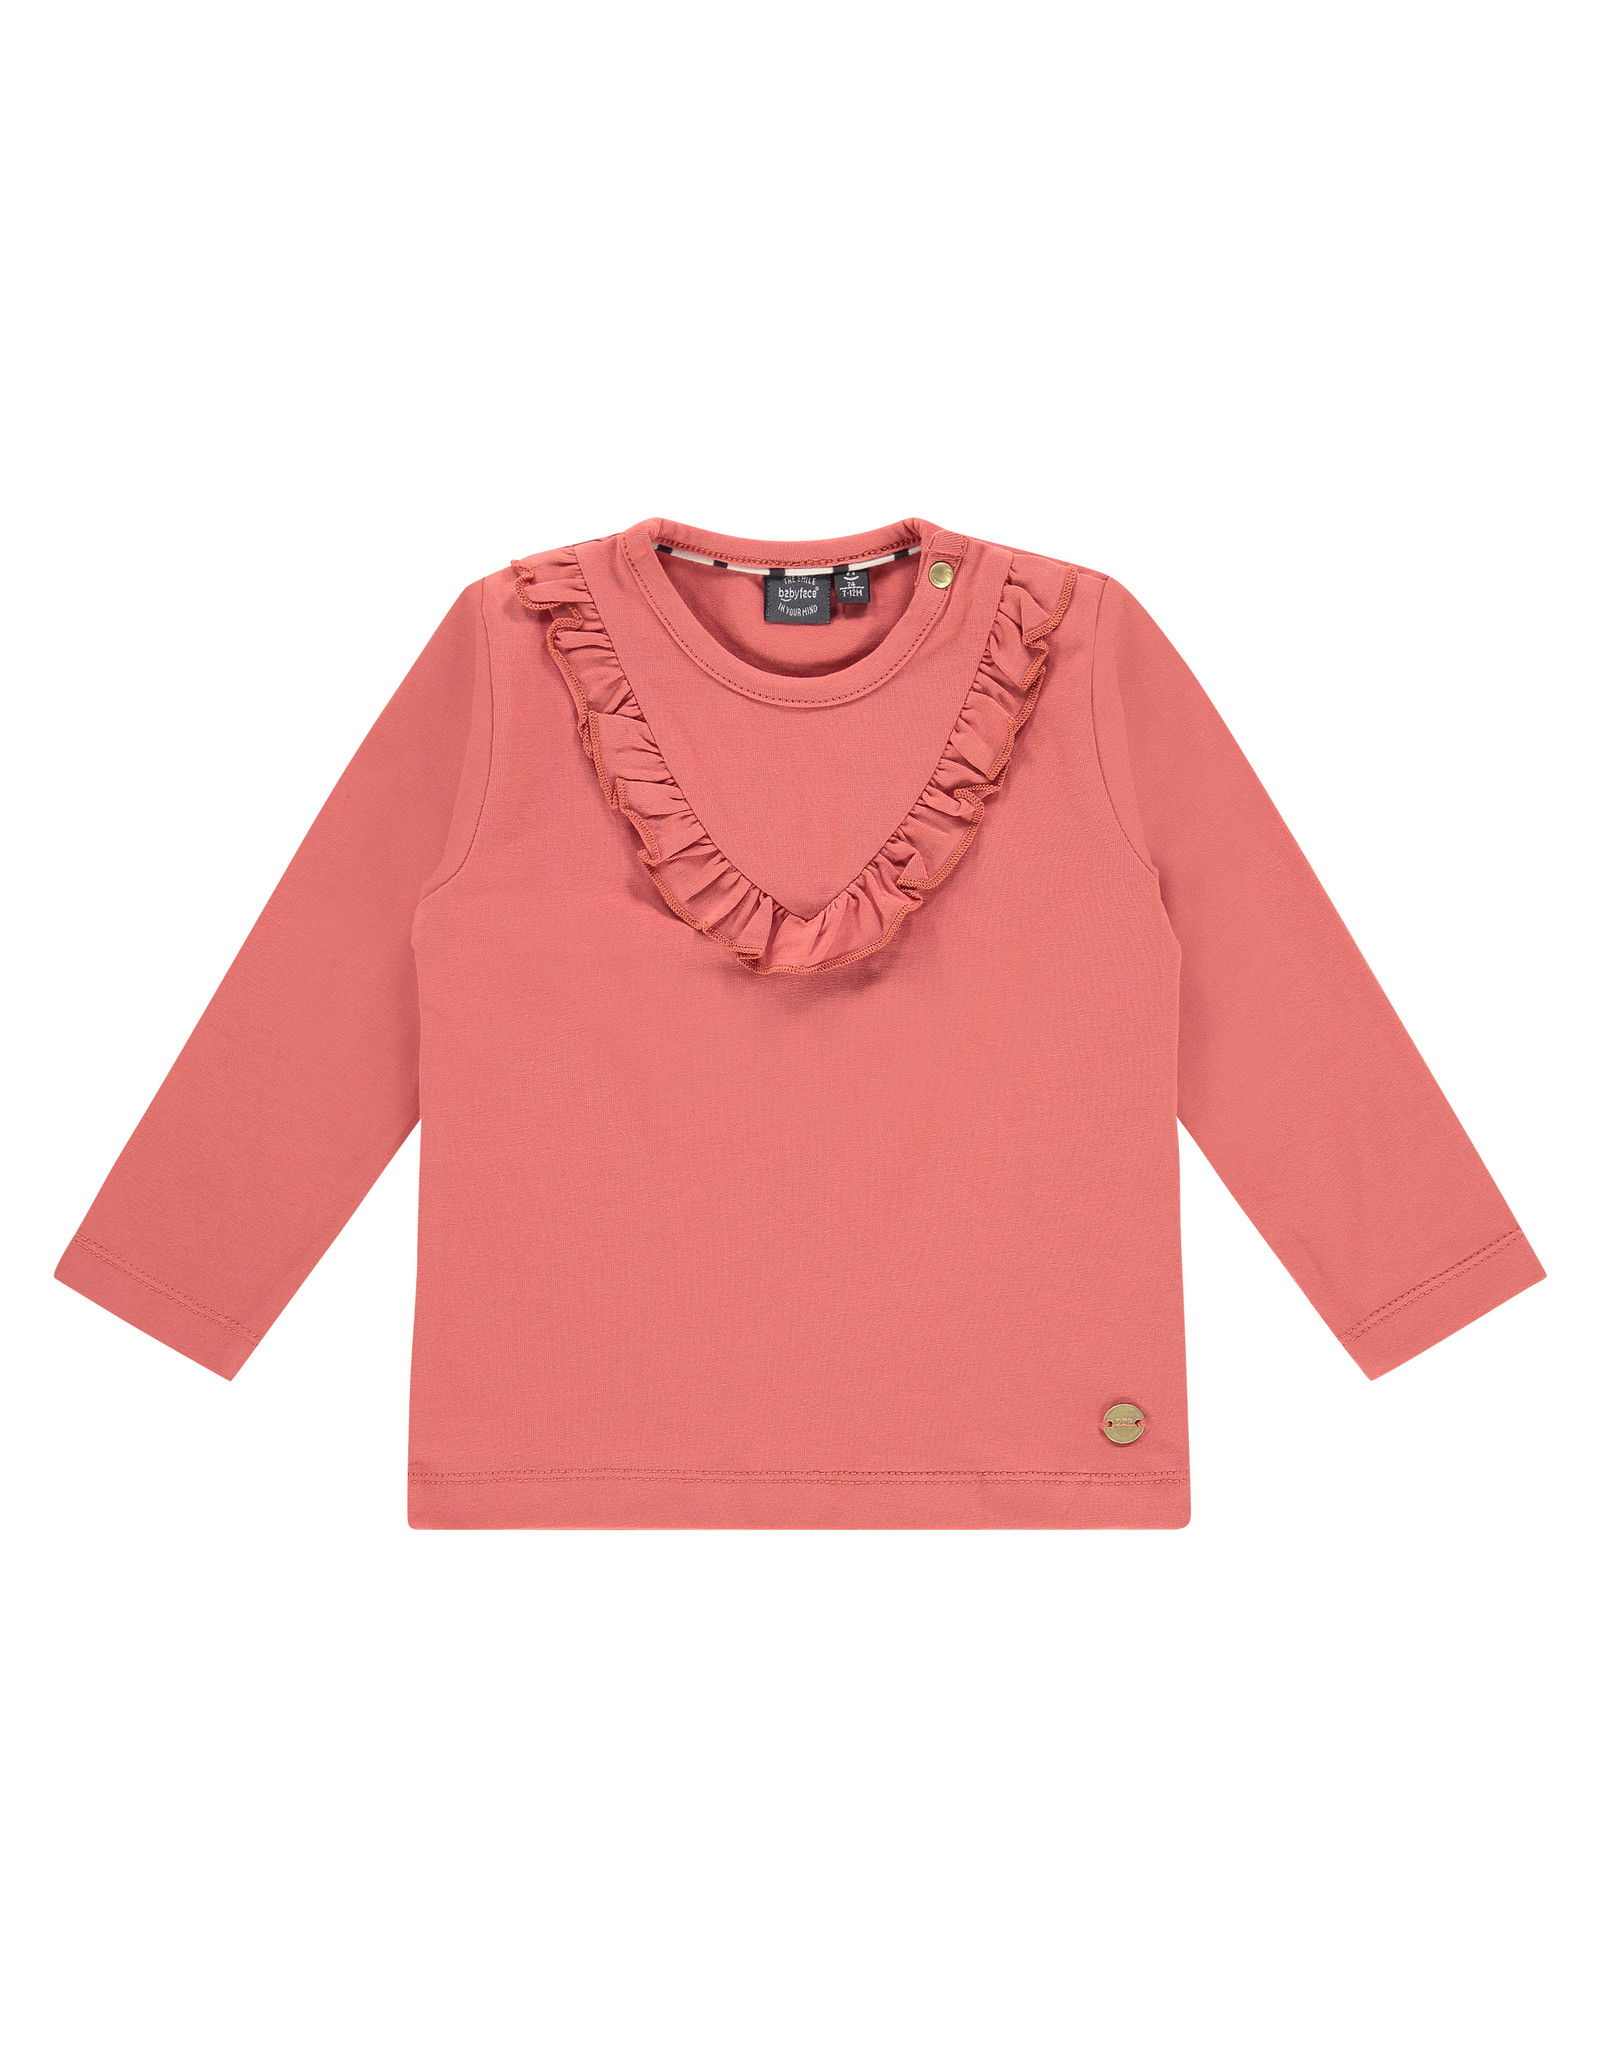 Babyface girls t-shirt long sleeve, faded rose, BBE21108604